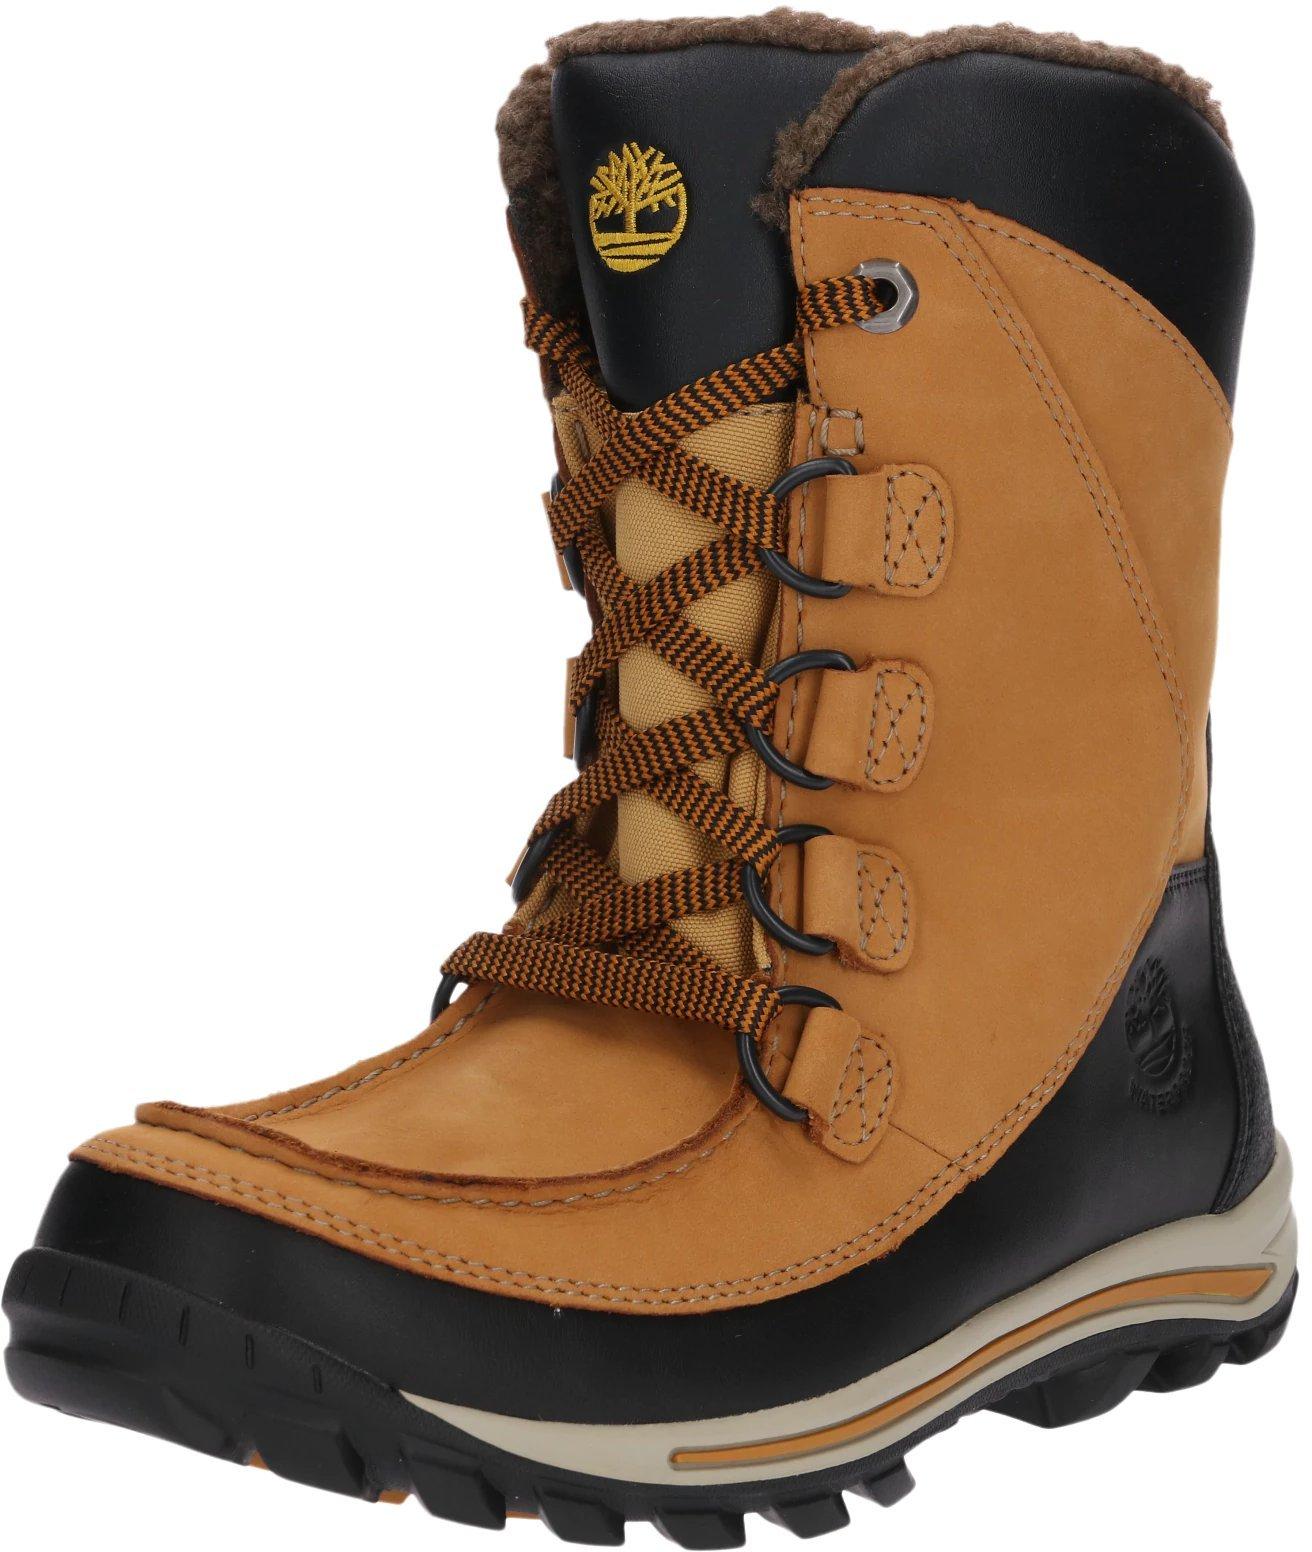 Boots Timberland Boots Preisvergleich Preisvergleich